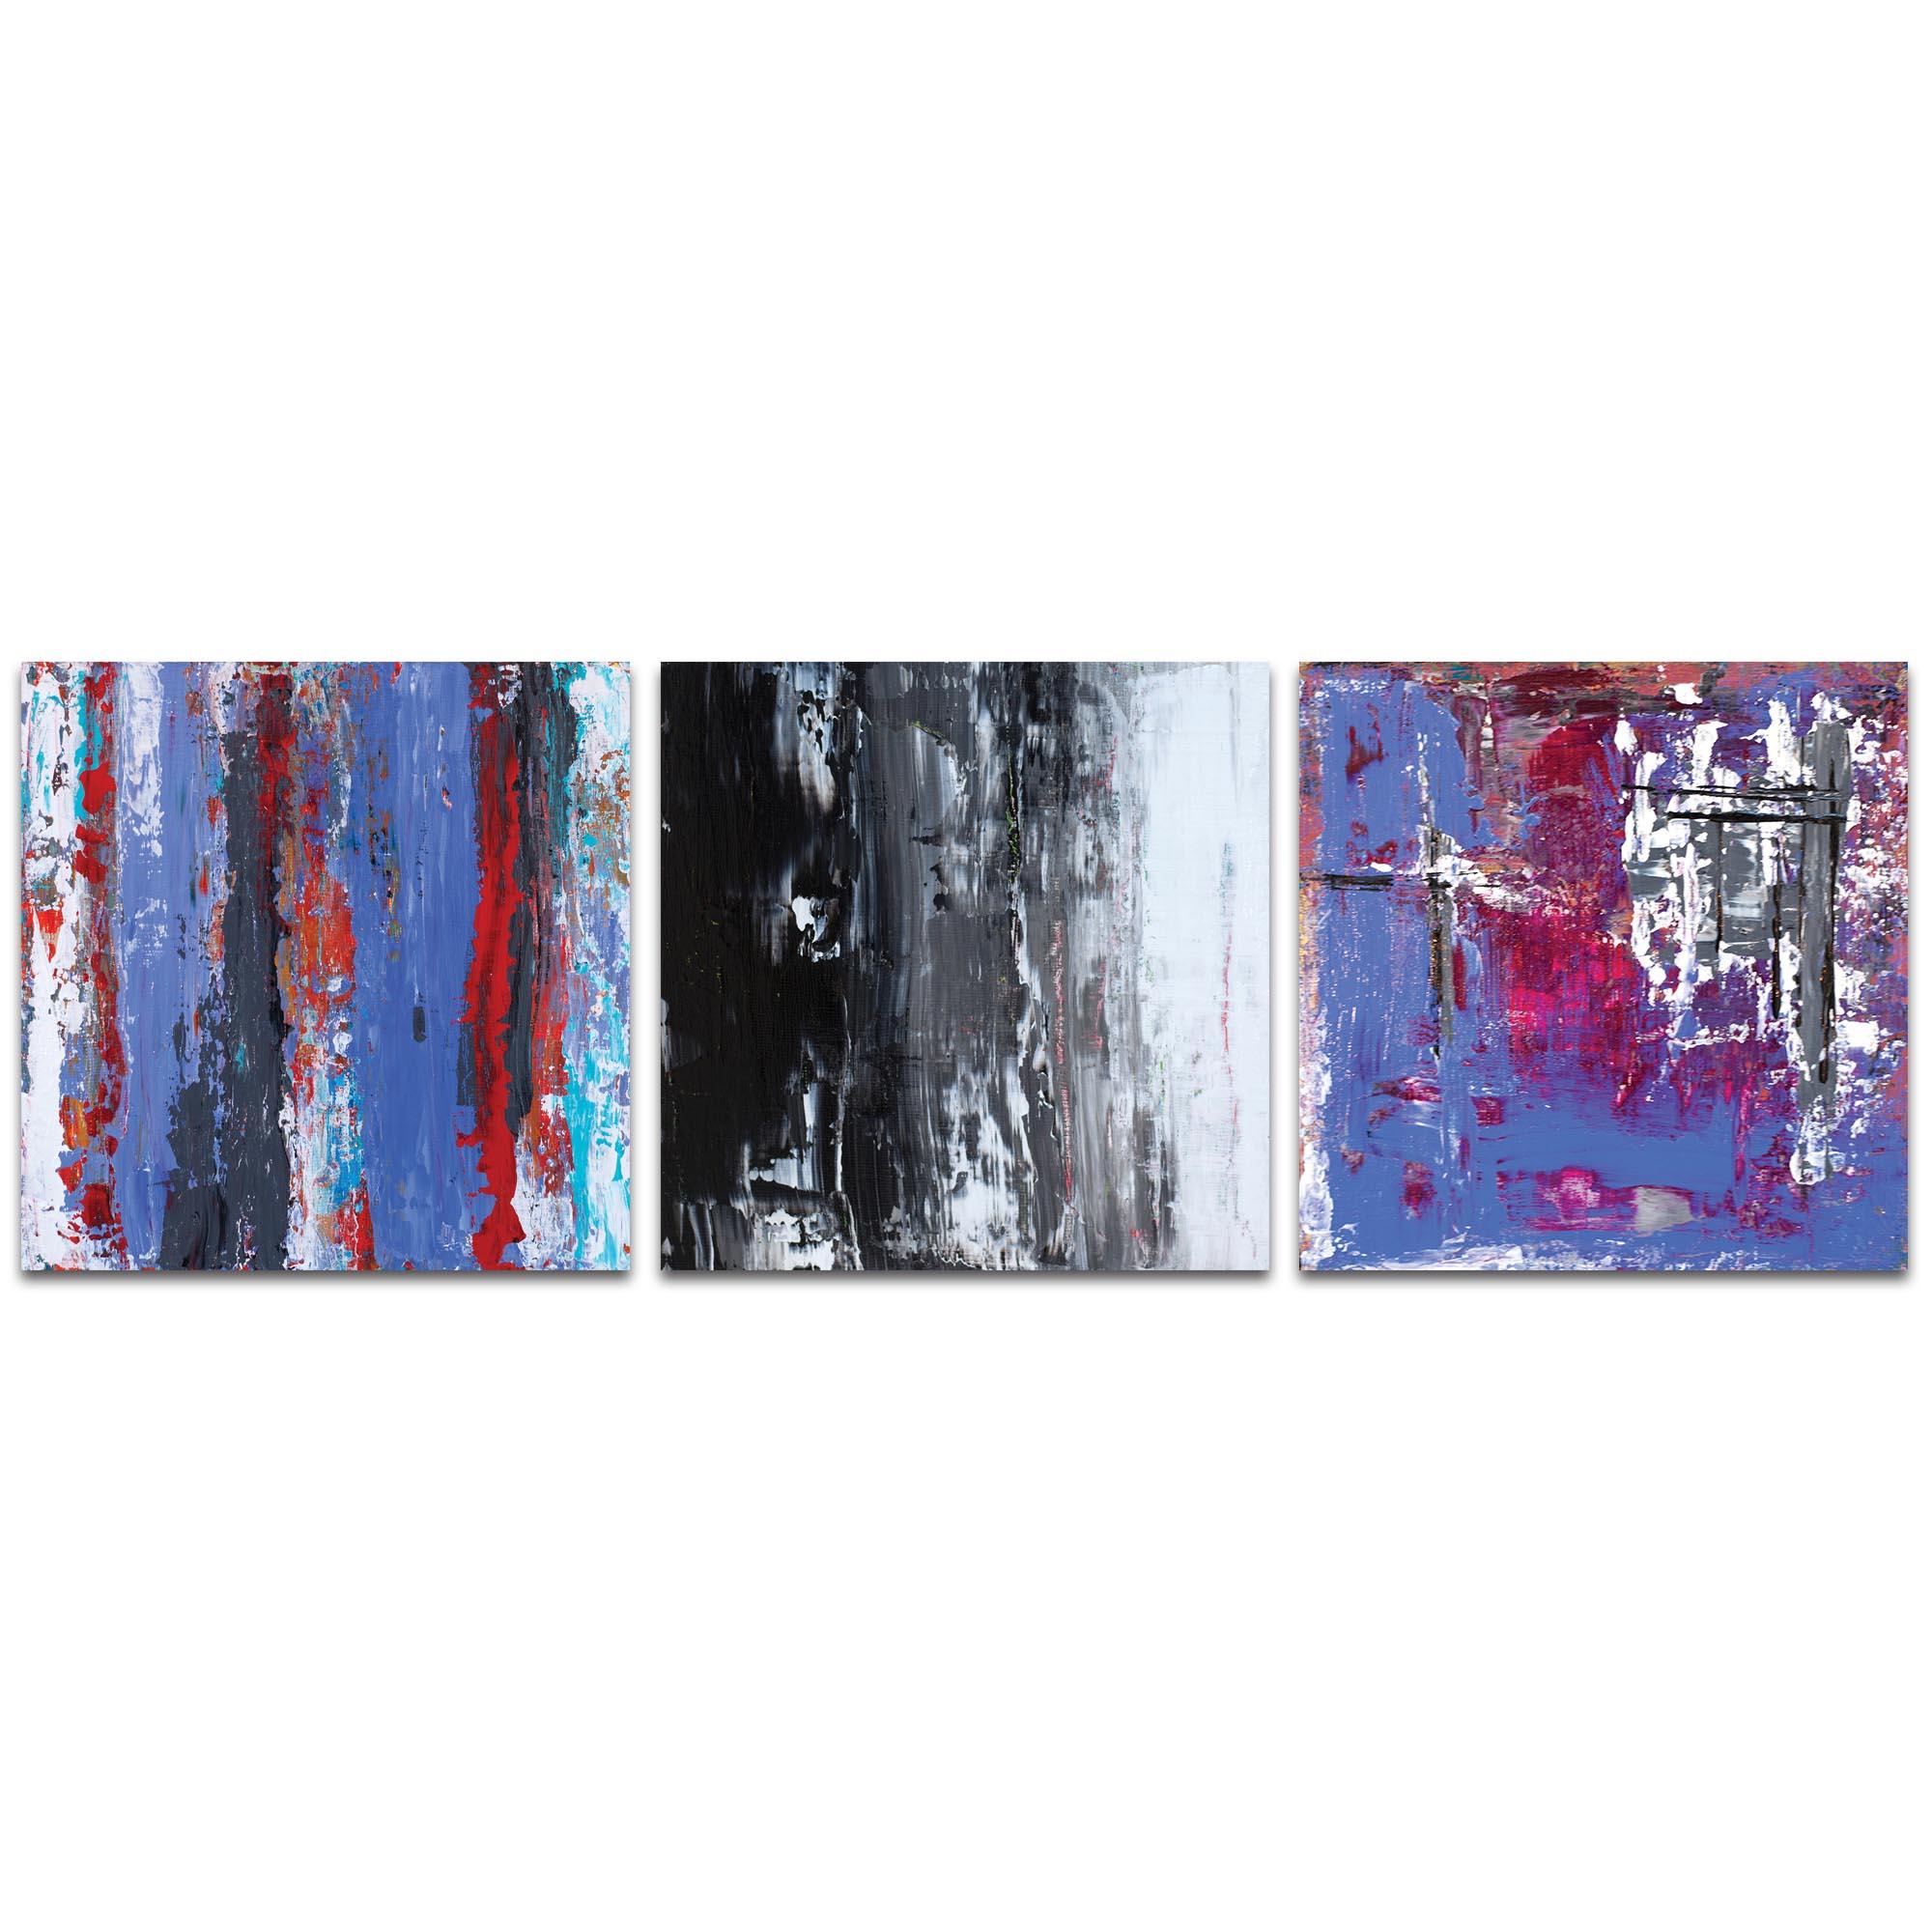 Abstract Wall Art 'Urban Triptych 4 Large' - Urban Decor on Metal or Plexiglass